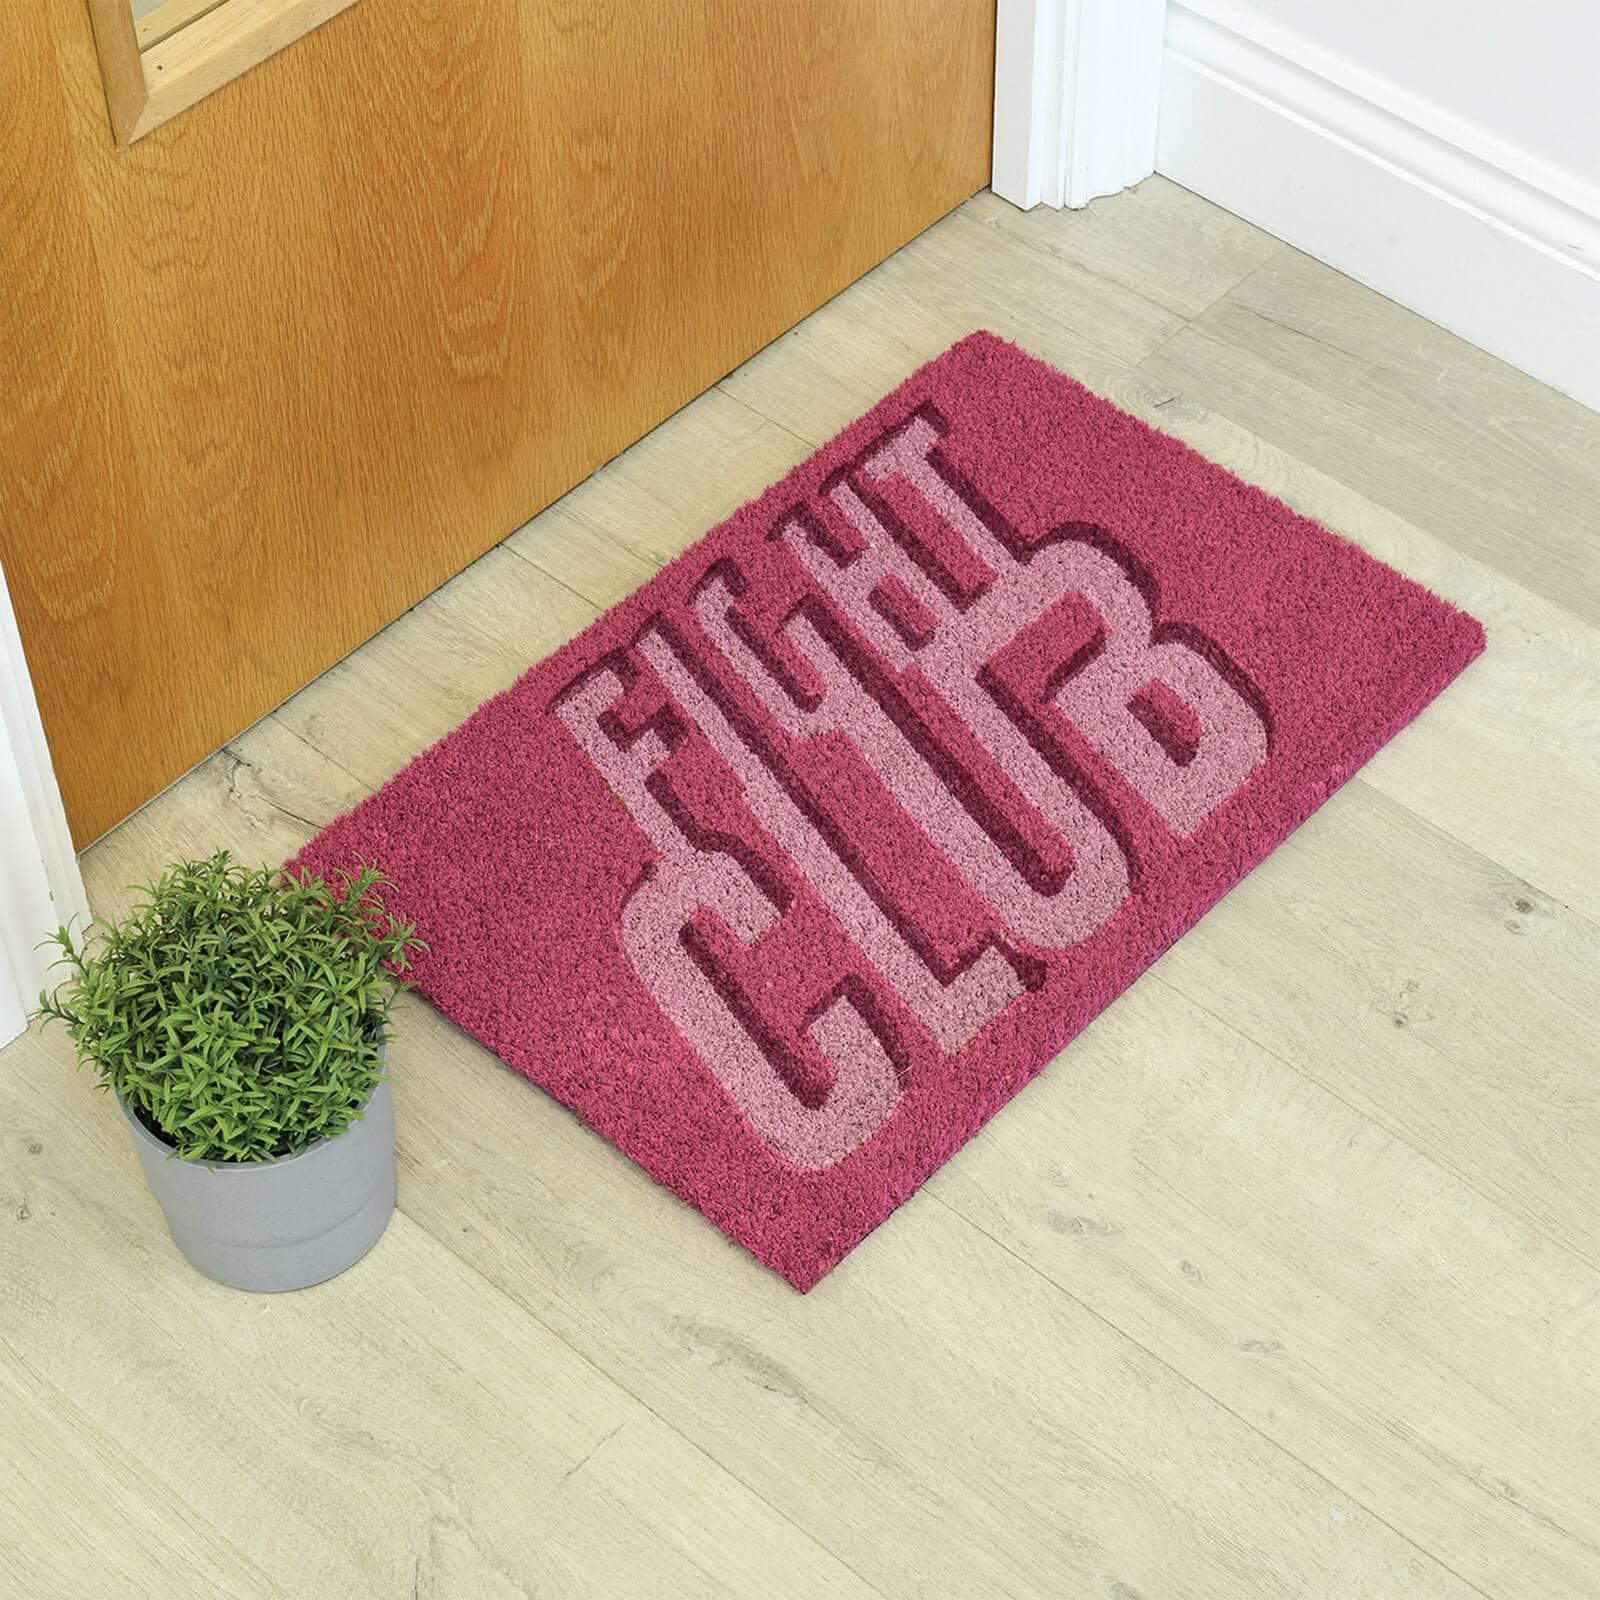 Image of Fight Club Soap Doormat